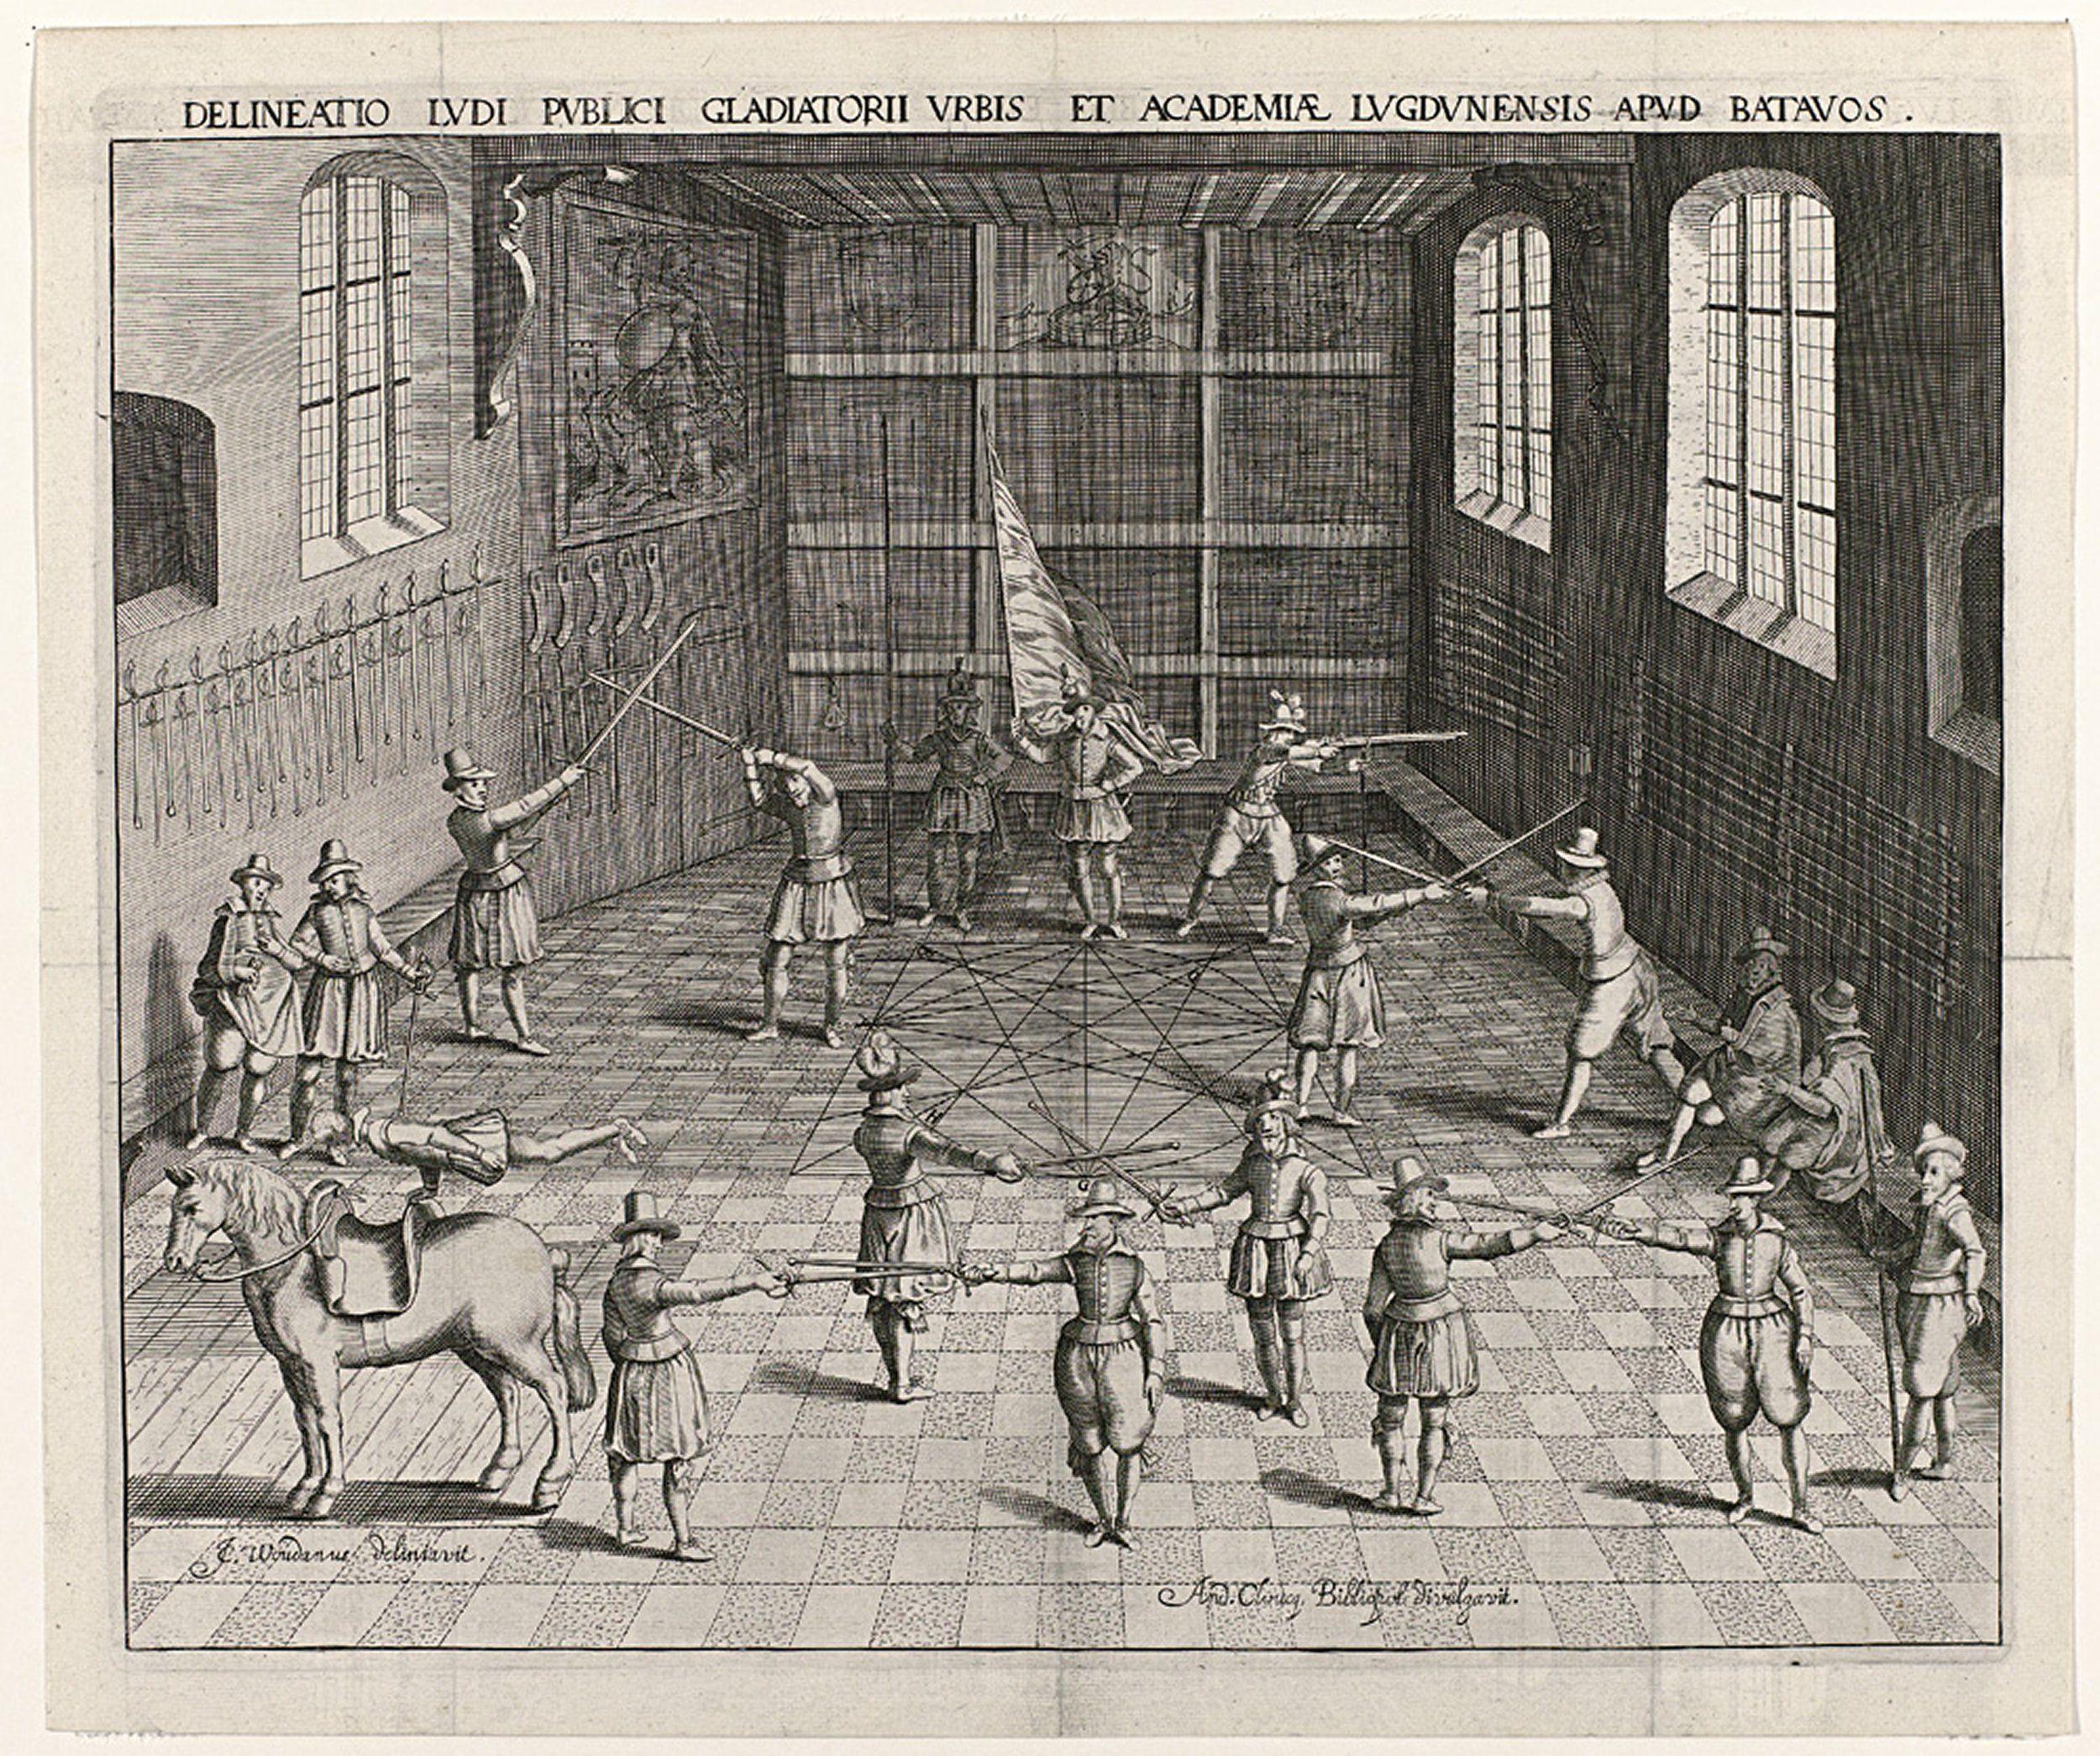 Fun back in lyon in the 17th century historical european